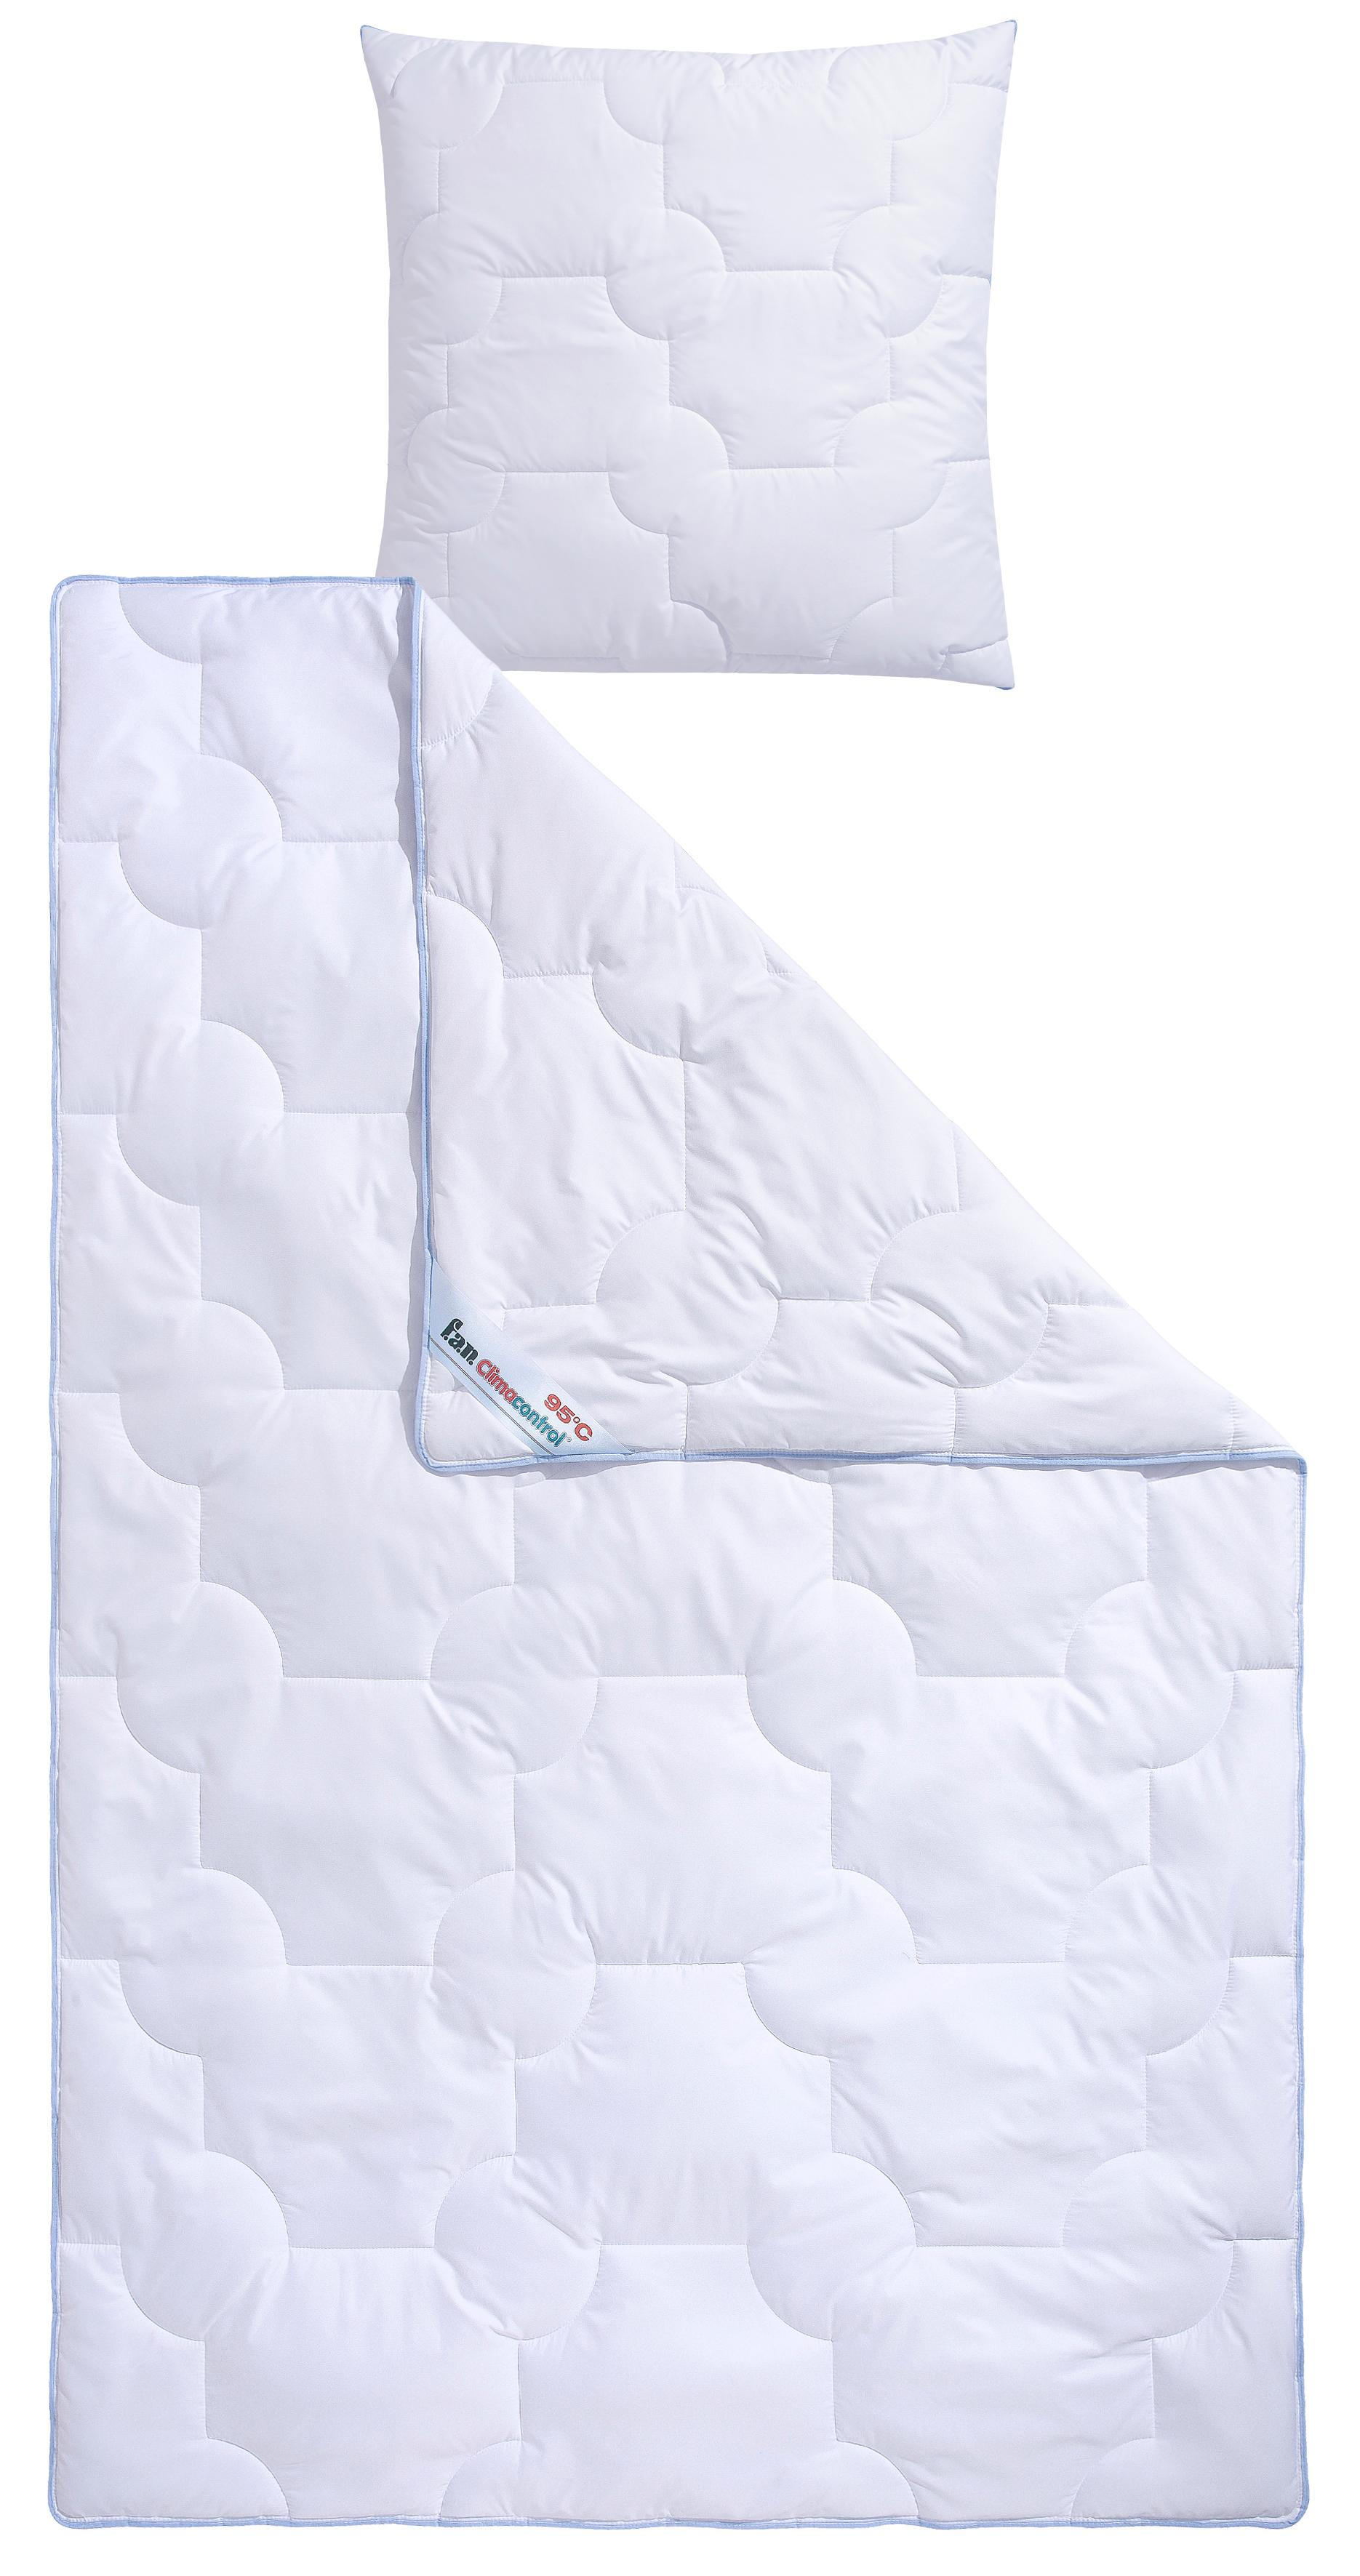 Microfaserbettdecken Kunstfaserkissen Climacontrol F A N Frankenstolz Normal Kaufen Baur